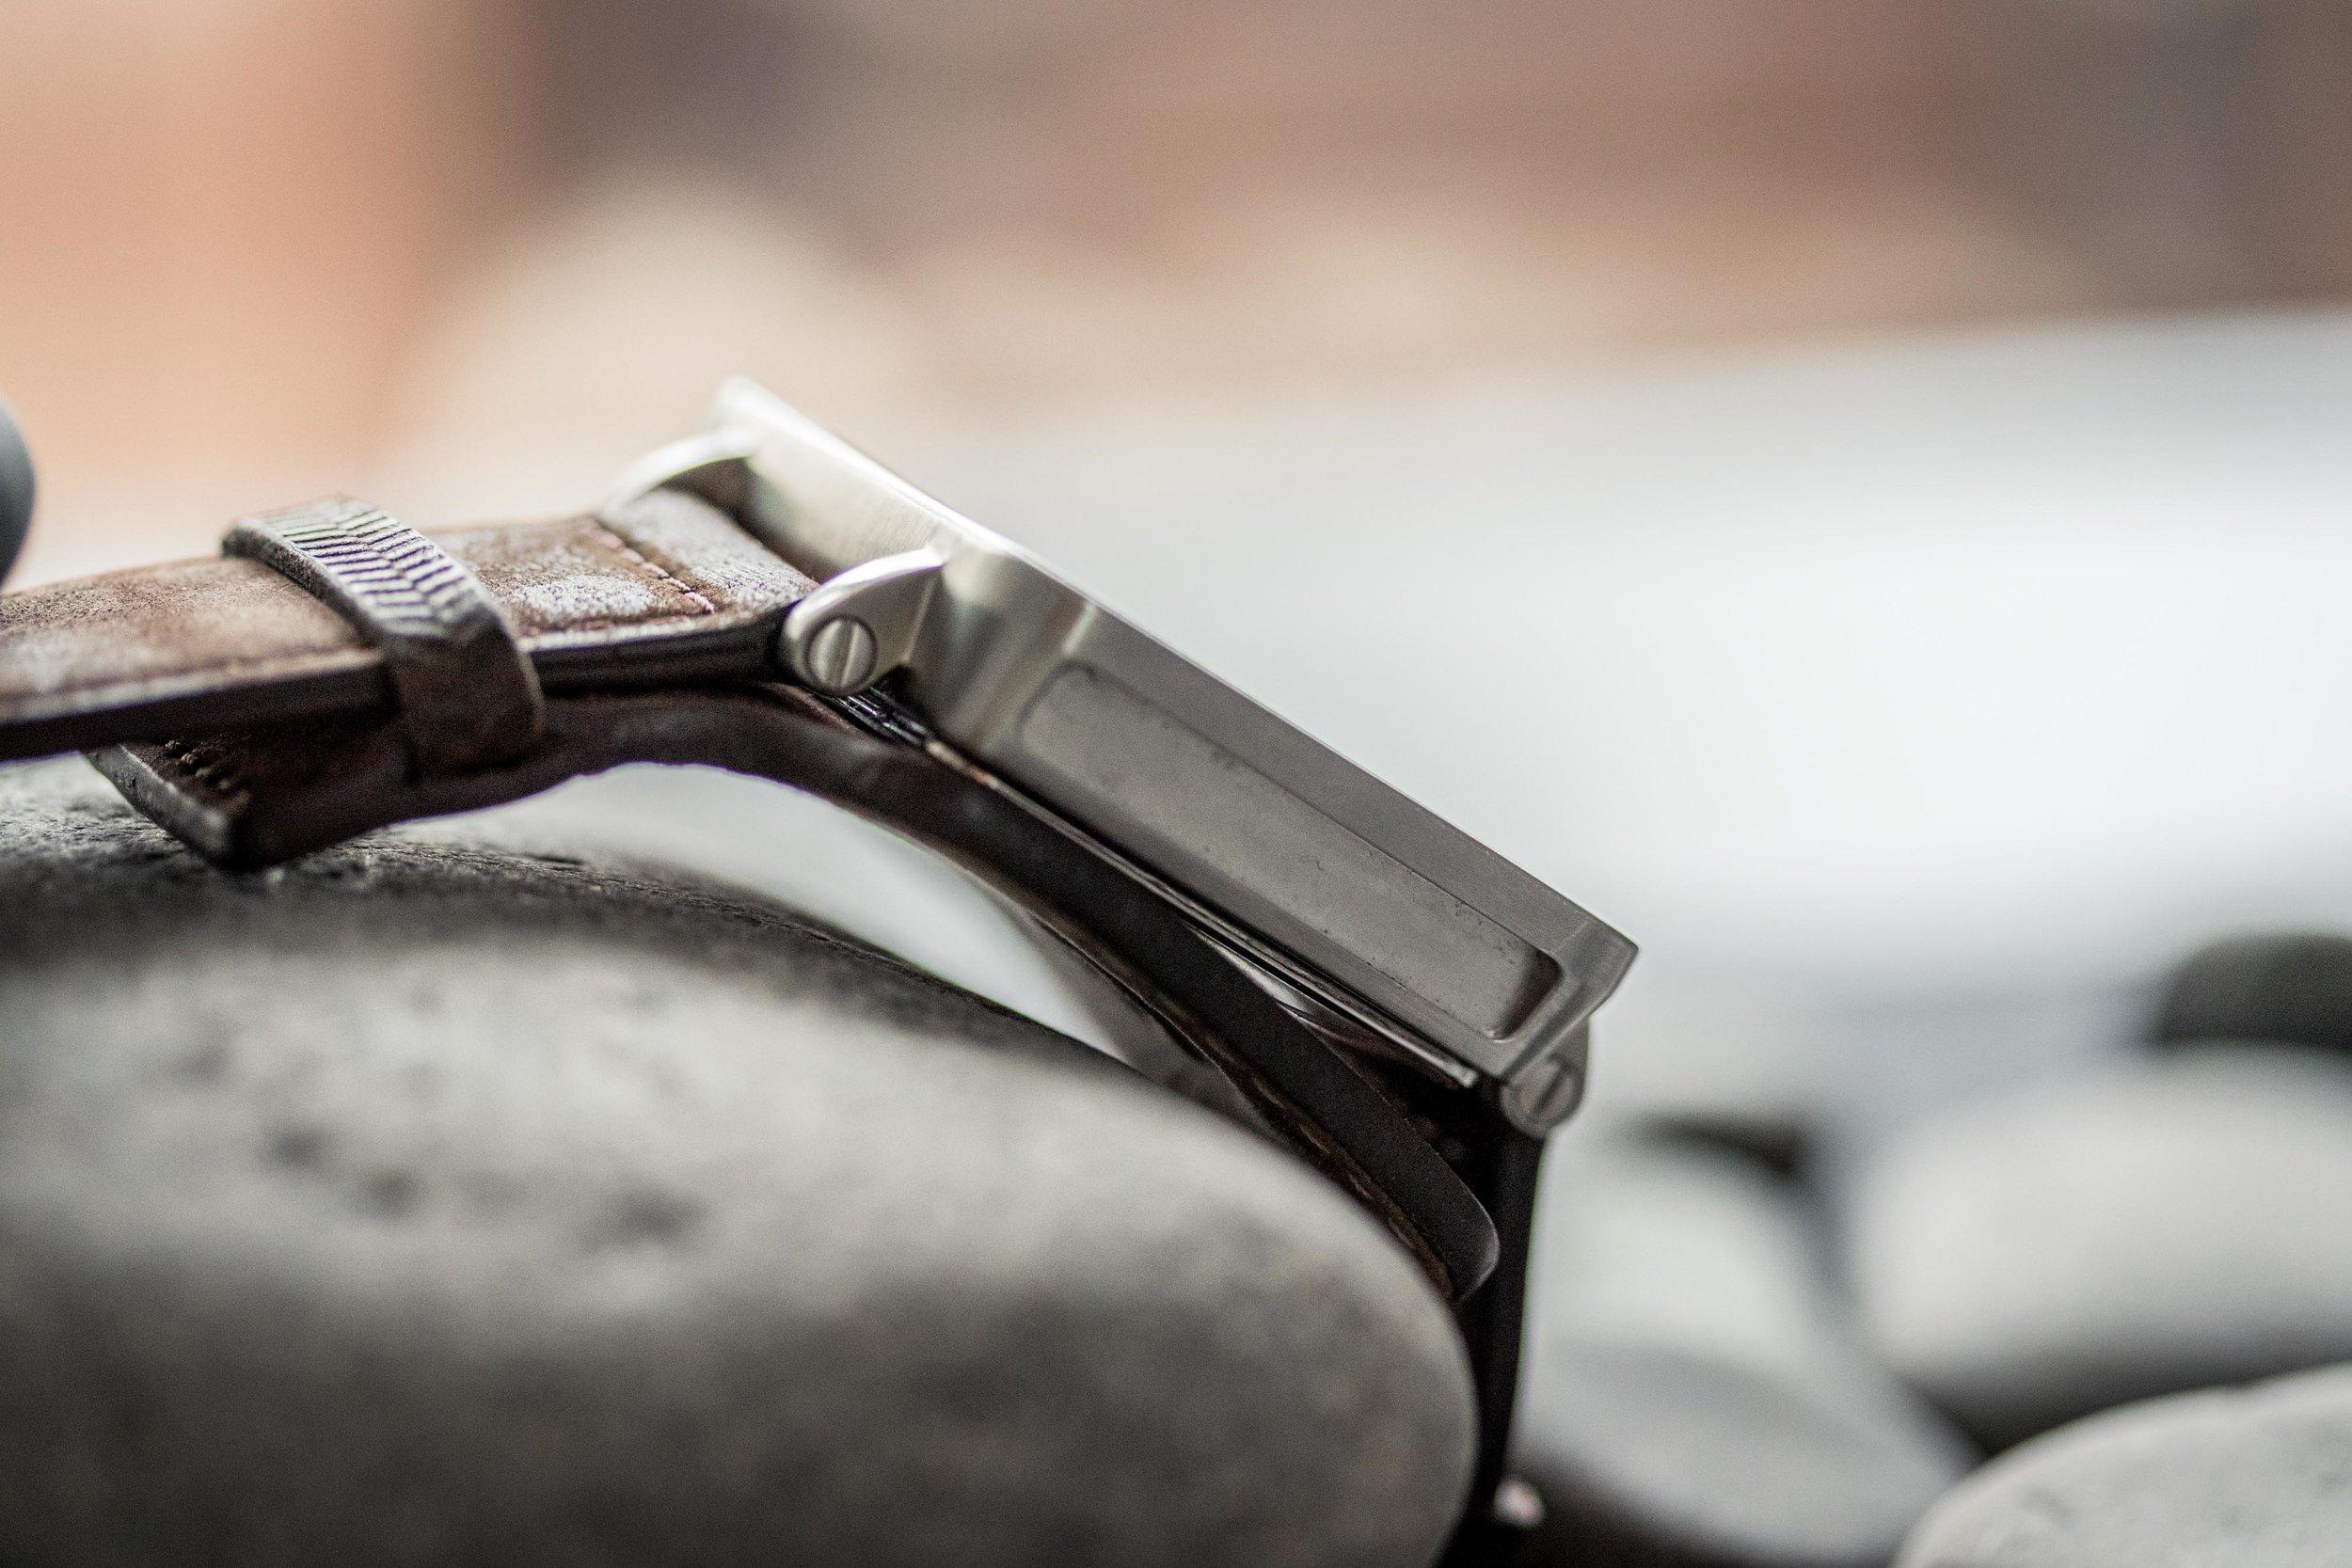 BPP 01 - Wristwatch YT-8.jpg